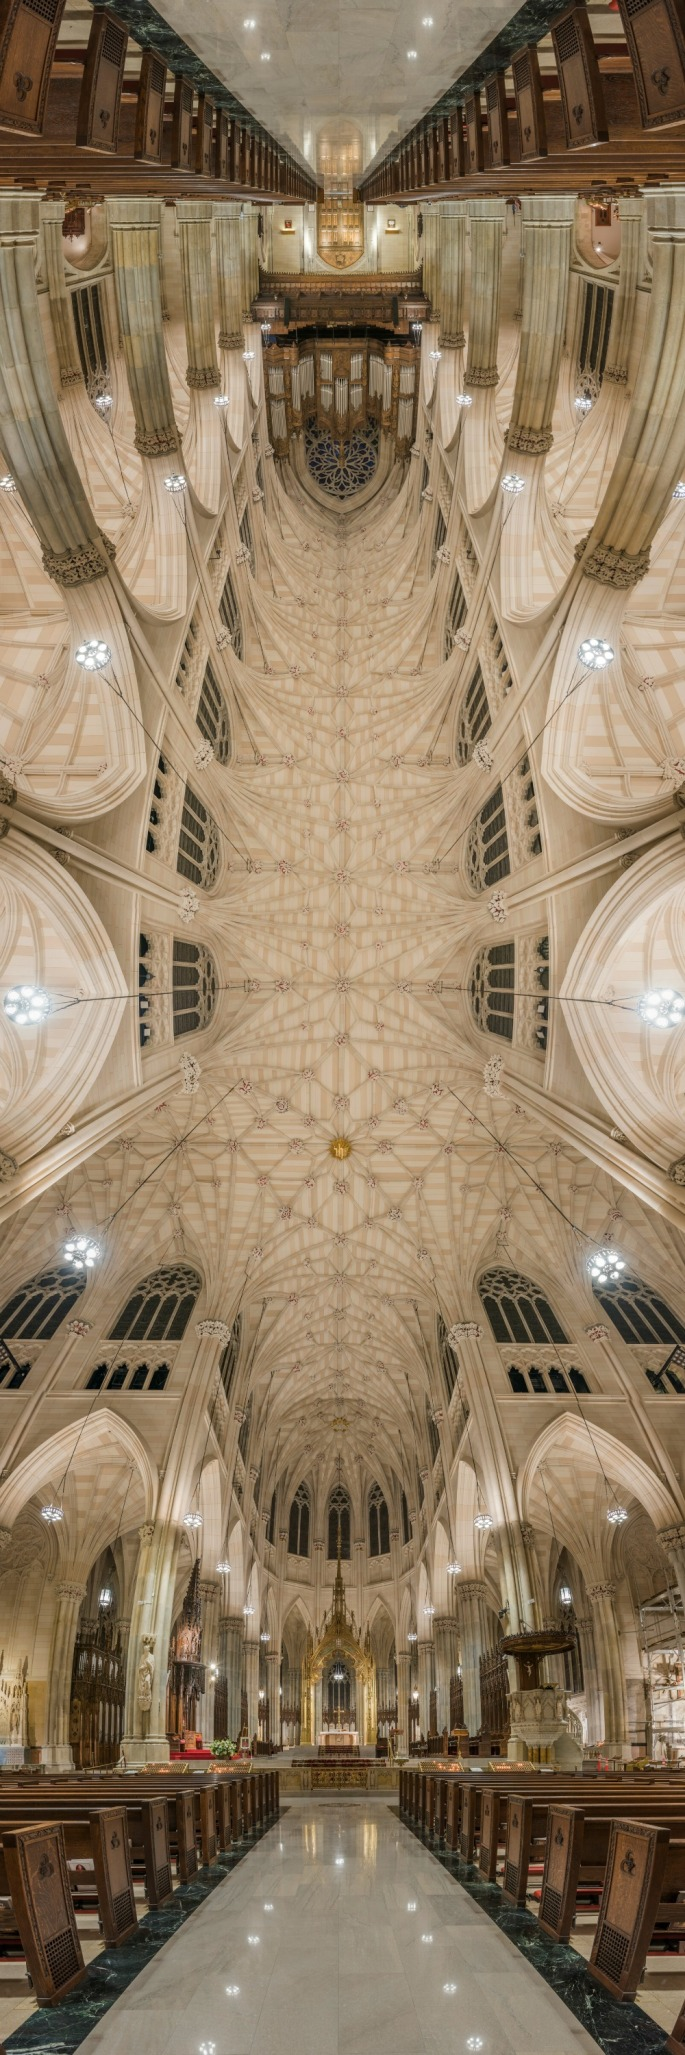 St-Patricks-Cathedral-_-©-Richard-Silver.jpg